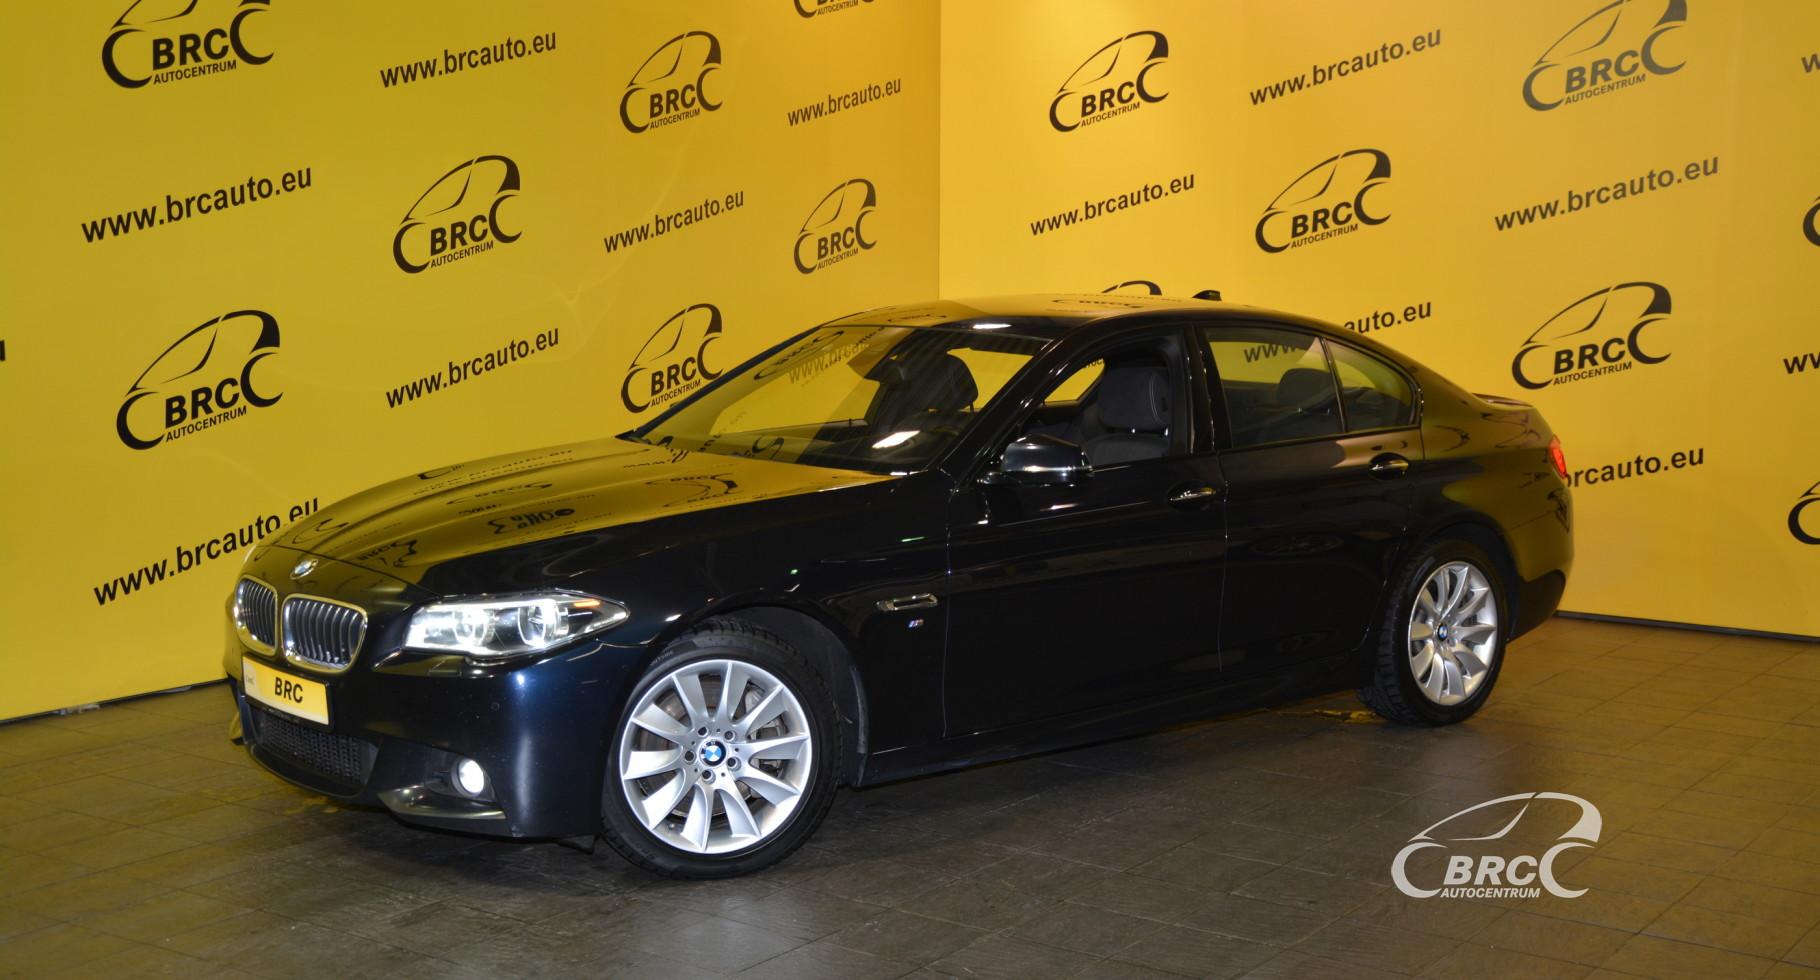 BMW 530 d xDrive M-paket FaceLift Automatas (ID: 797569) | BRC ...